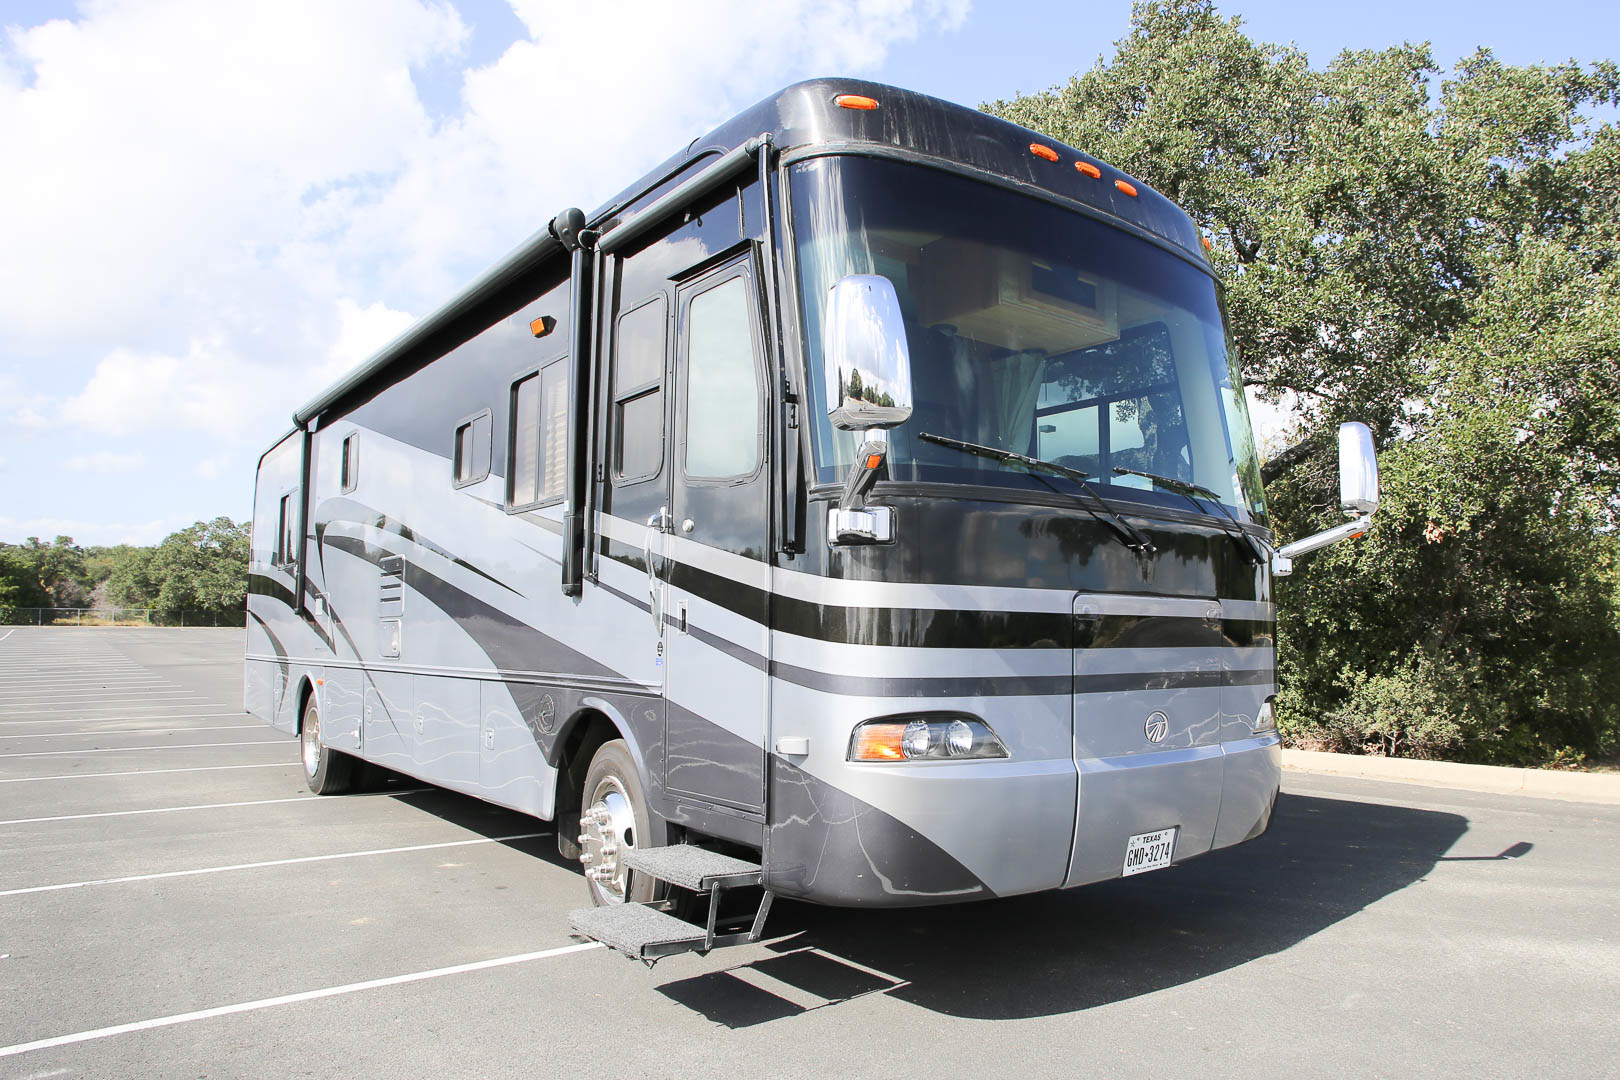 American Adventure RV Rentals image 3